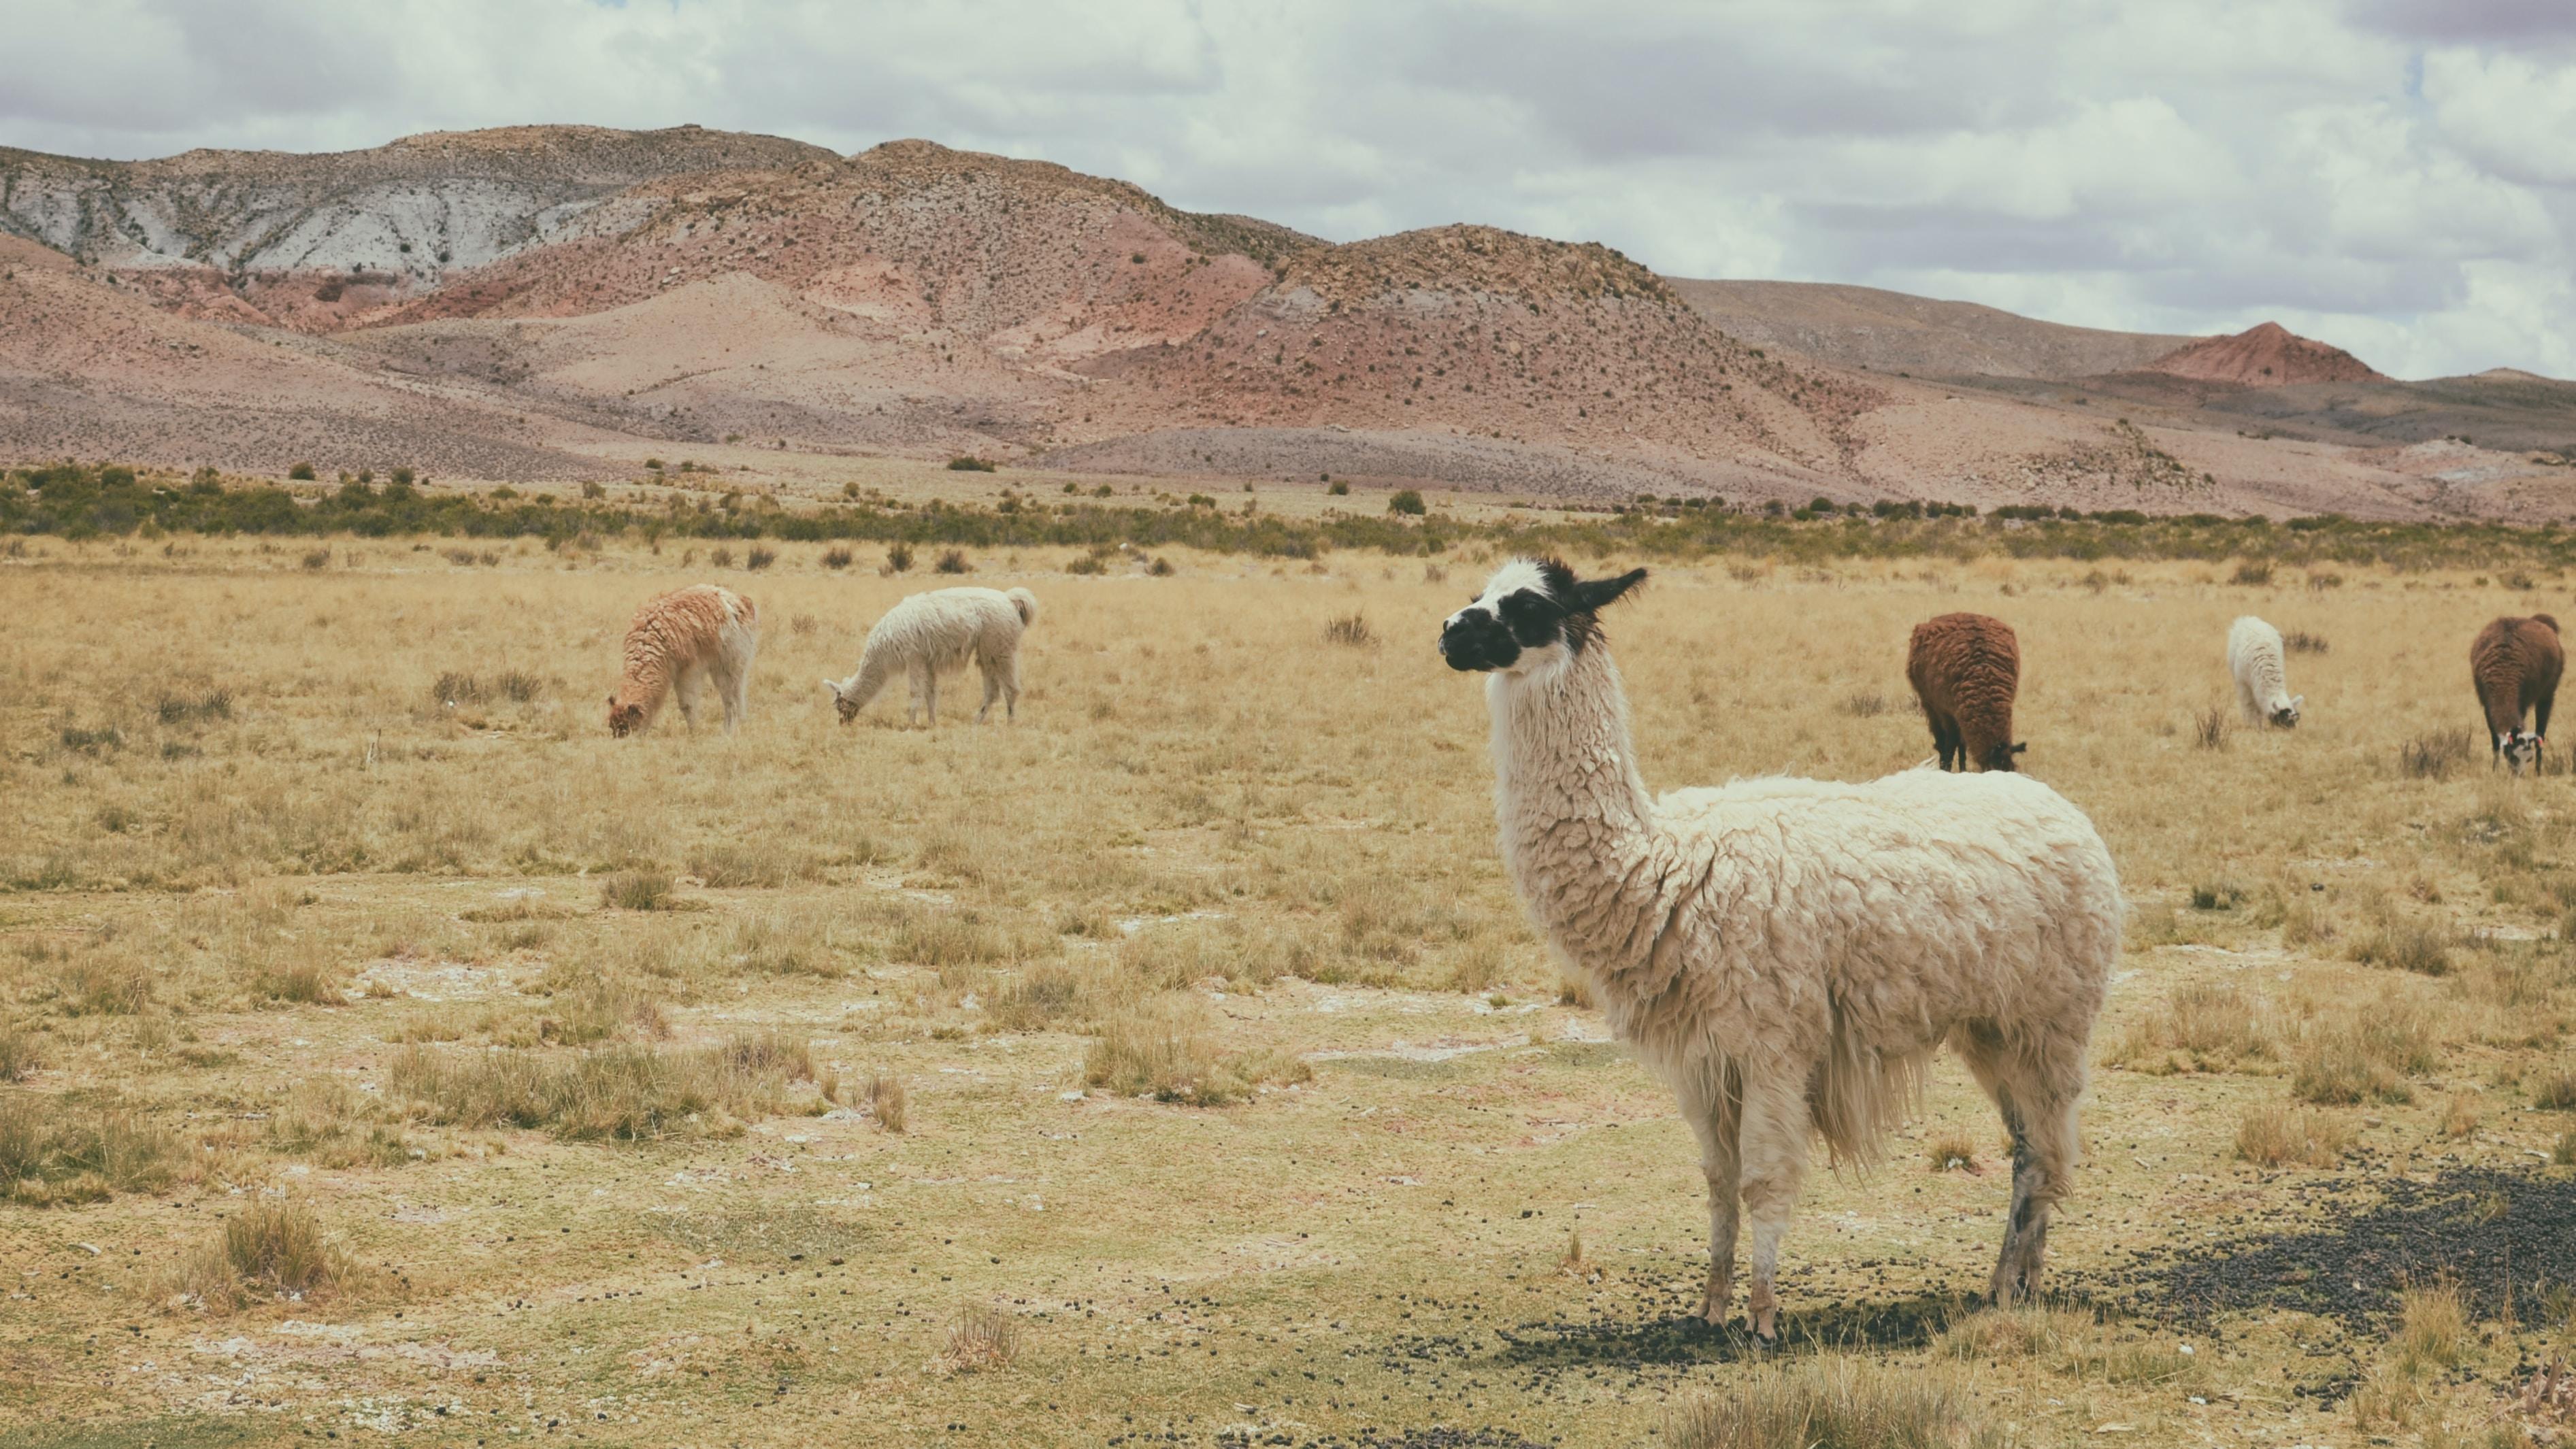 Llamas and alpacas graze in the desert field of Tupiza